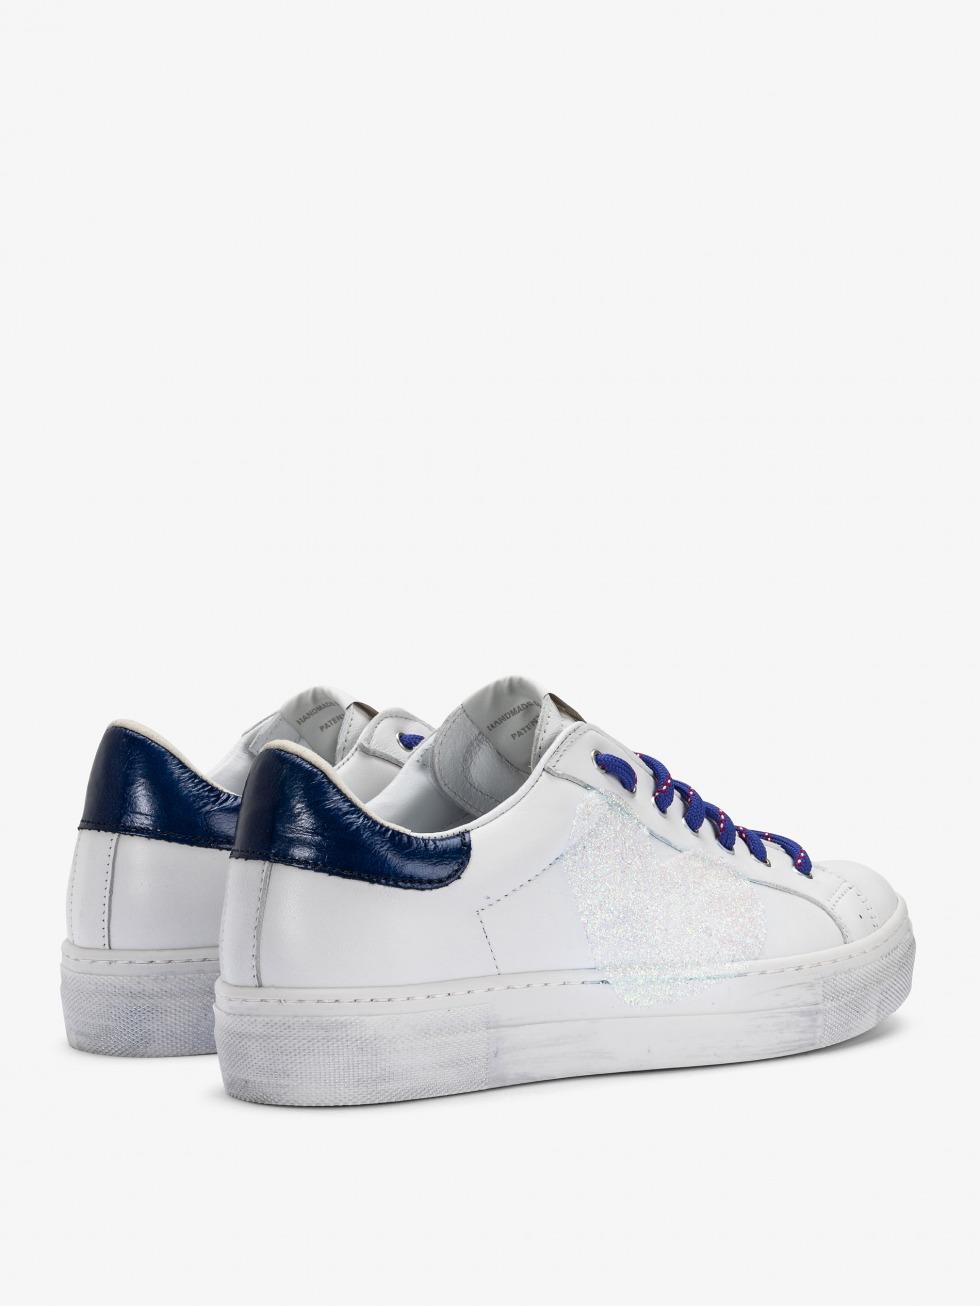 Martini Sneakers Vintage Blue Lips - Heart